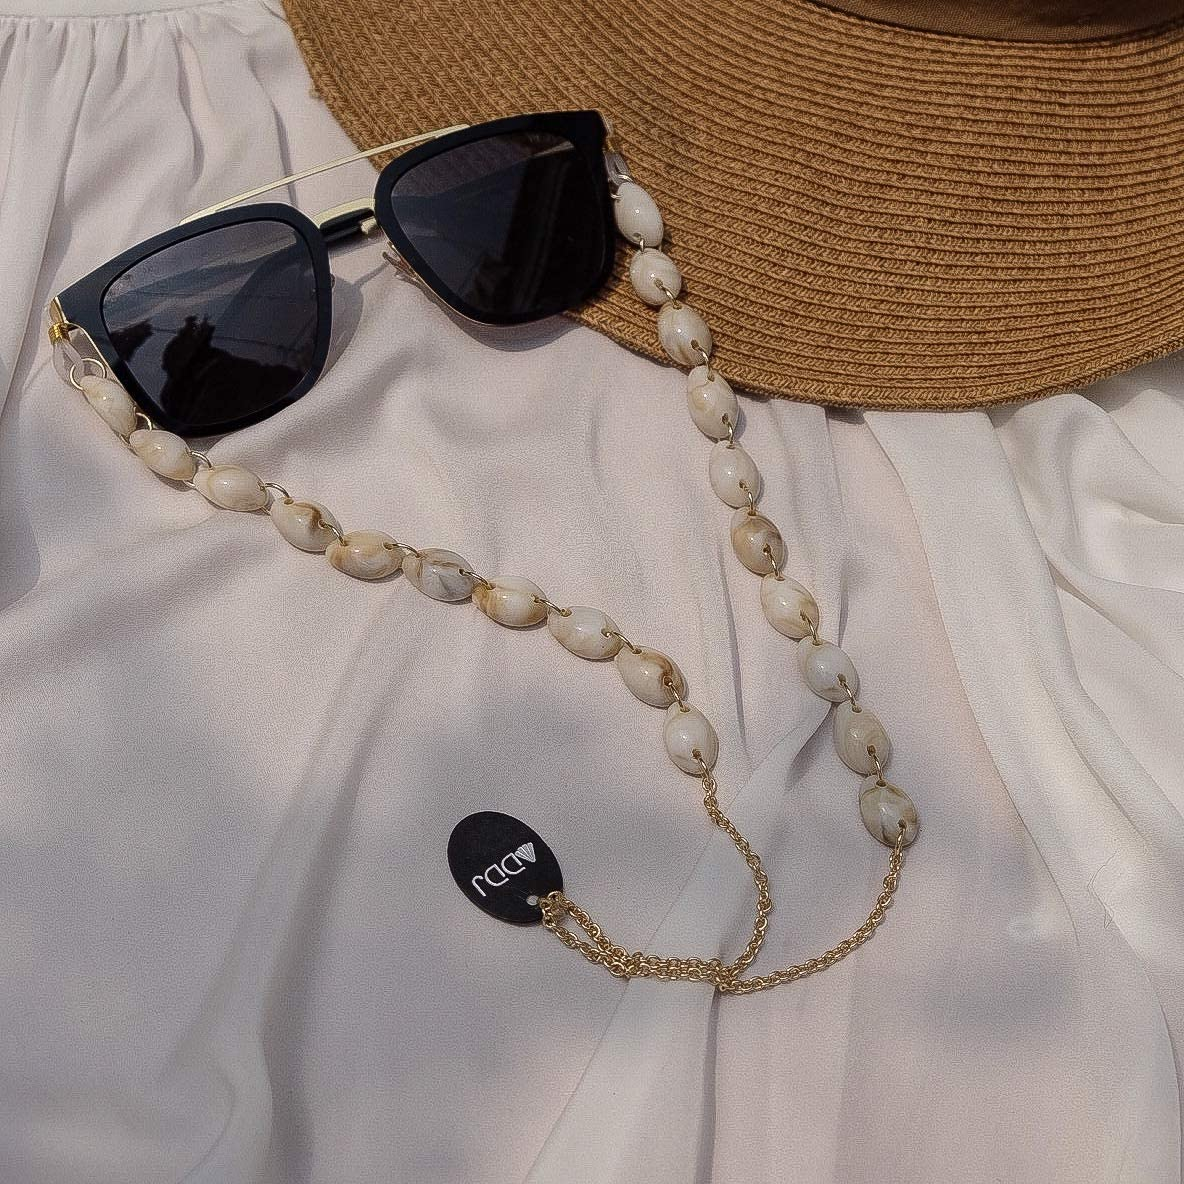 ADDJ Eyeglasses Chains Eyewear Strap Sunglasses Holder Reading Glasses Retainer Lanyard Cowrie Shell Conch